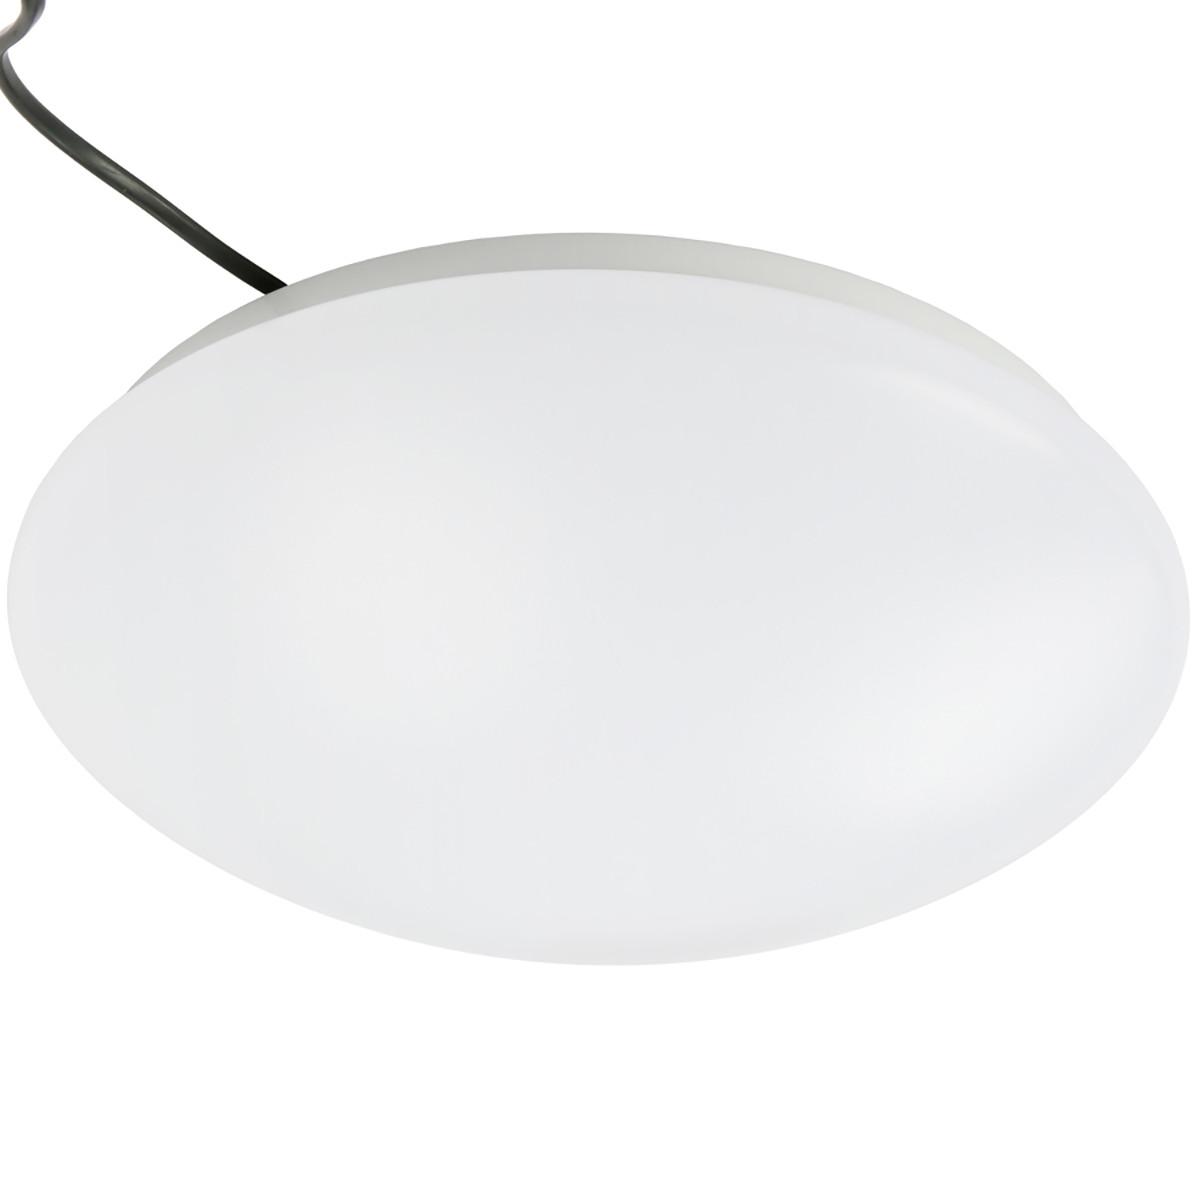 White Acrylic Led Ceiling Light Fixture Flush Mount Lamp: 24W 14.96 Inch Modern LED Flush Mount Ceiling Light